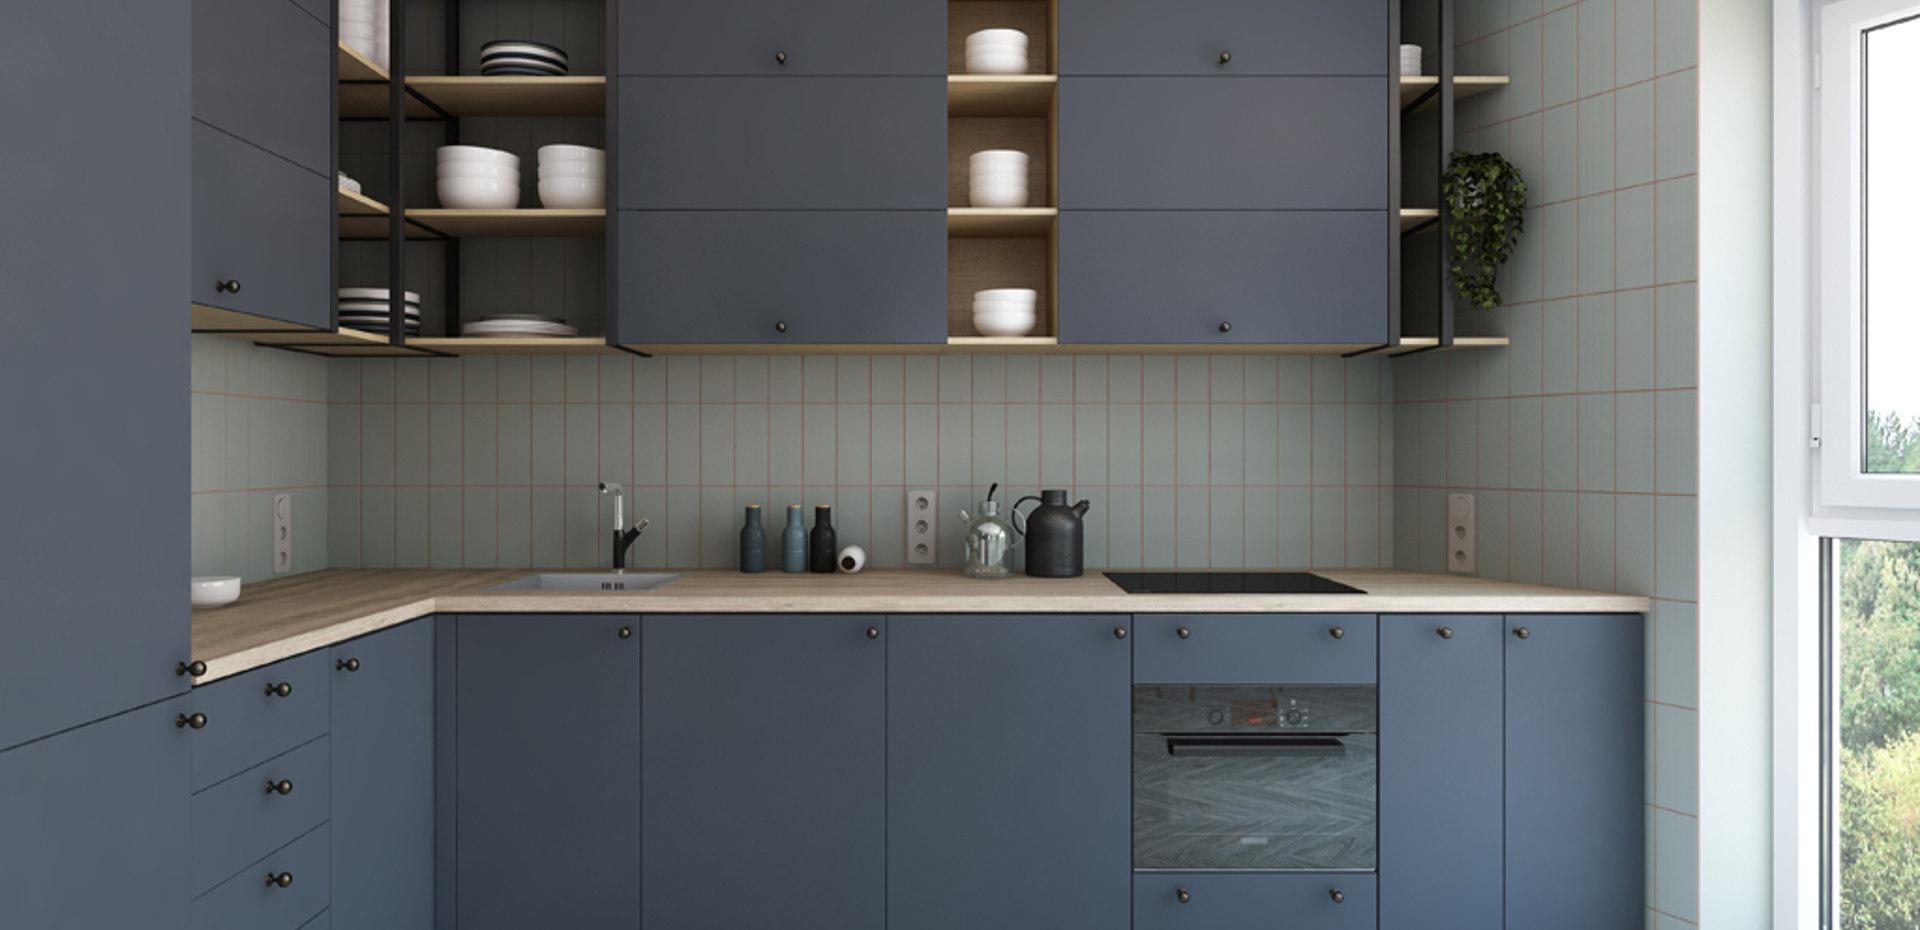 Ceramiche-Vogue-Fughe-colorate-Addessi-Design-Decoration (5)